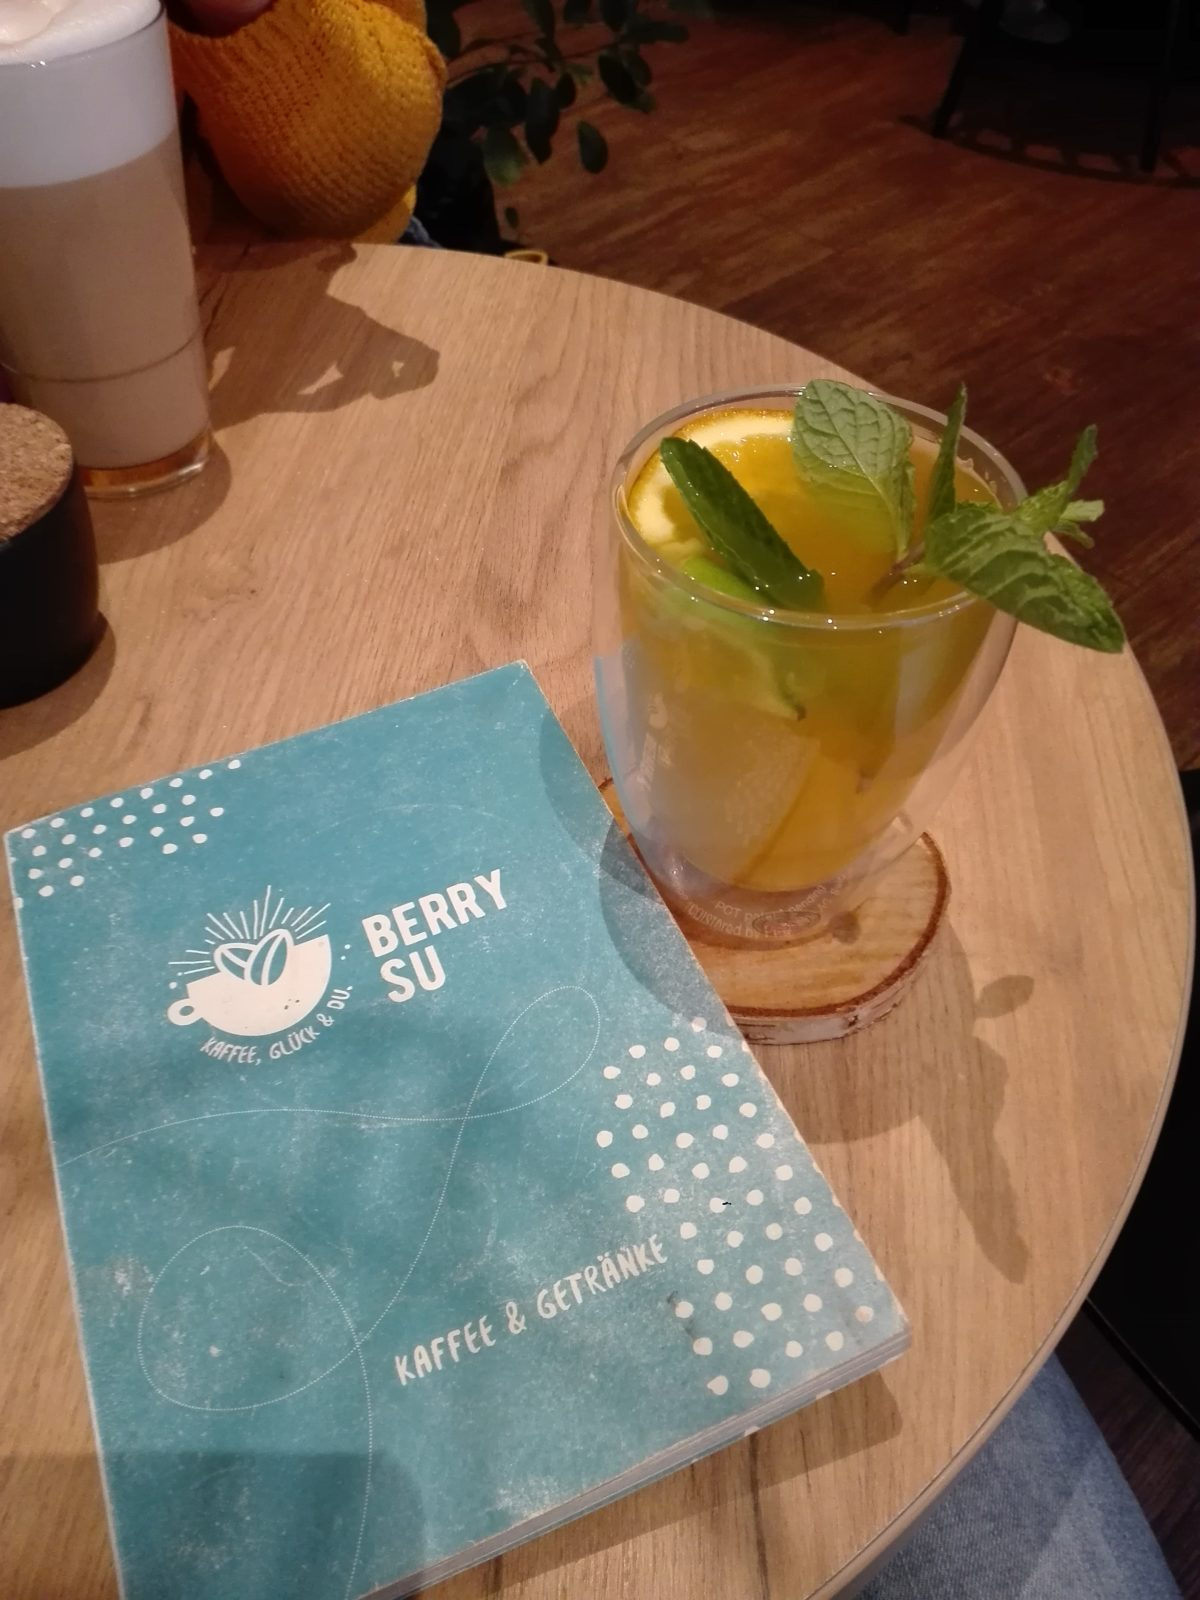 Café Berry Su #Karlsruhe #Cafe| chilibluetendotcom